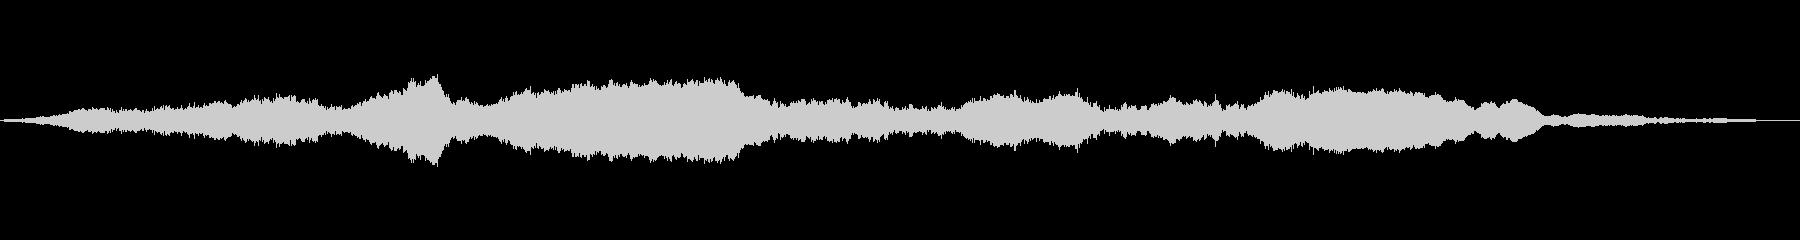 ownれた低音のシンセトーンの未再生の波形